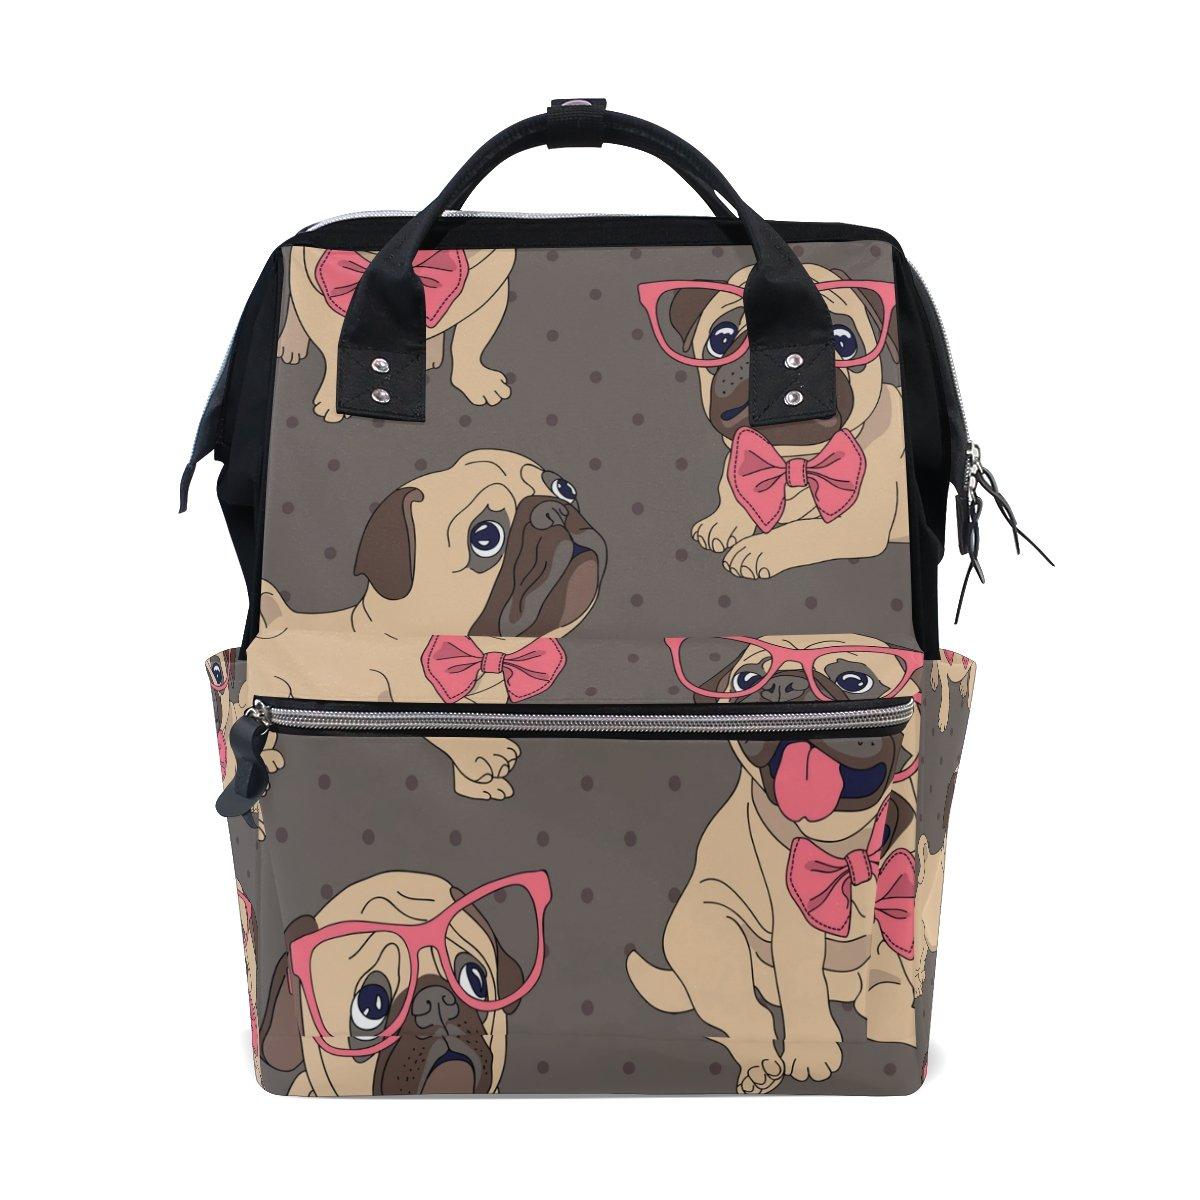 Wozo Cartoon Pug Puppy Glasses Polka Dot多機能おむつバッグバックパック旅行バッグ   B07D6D7K5N